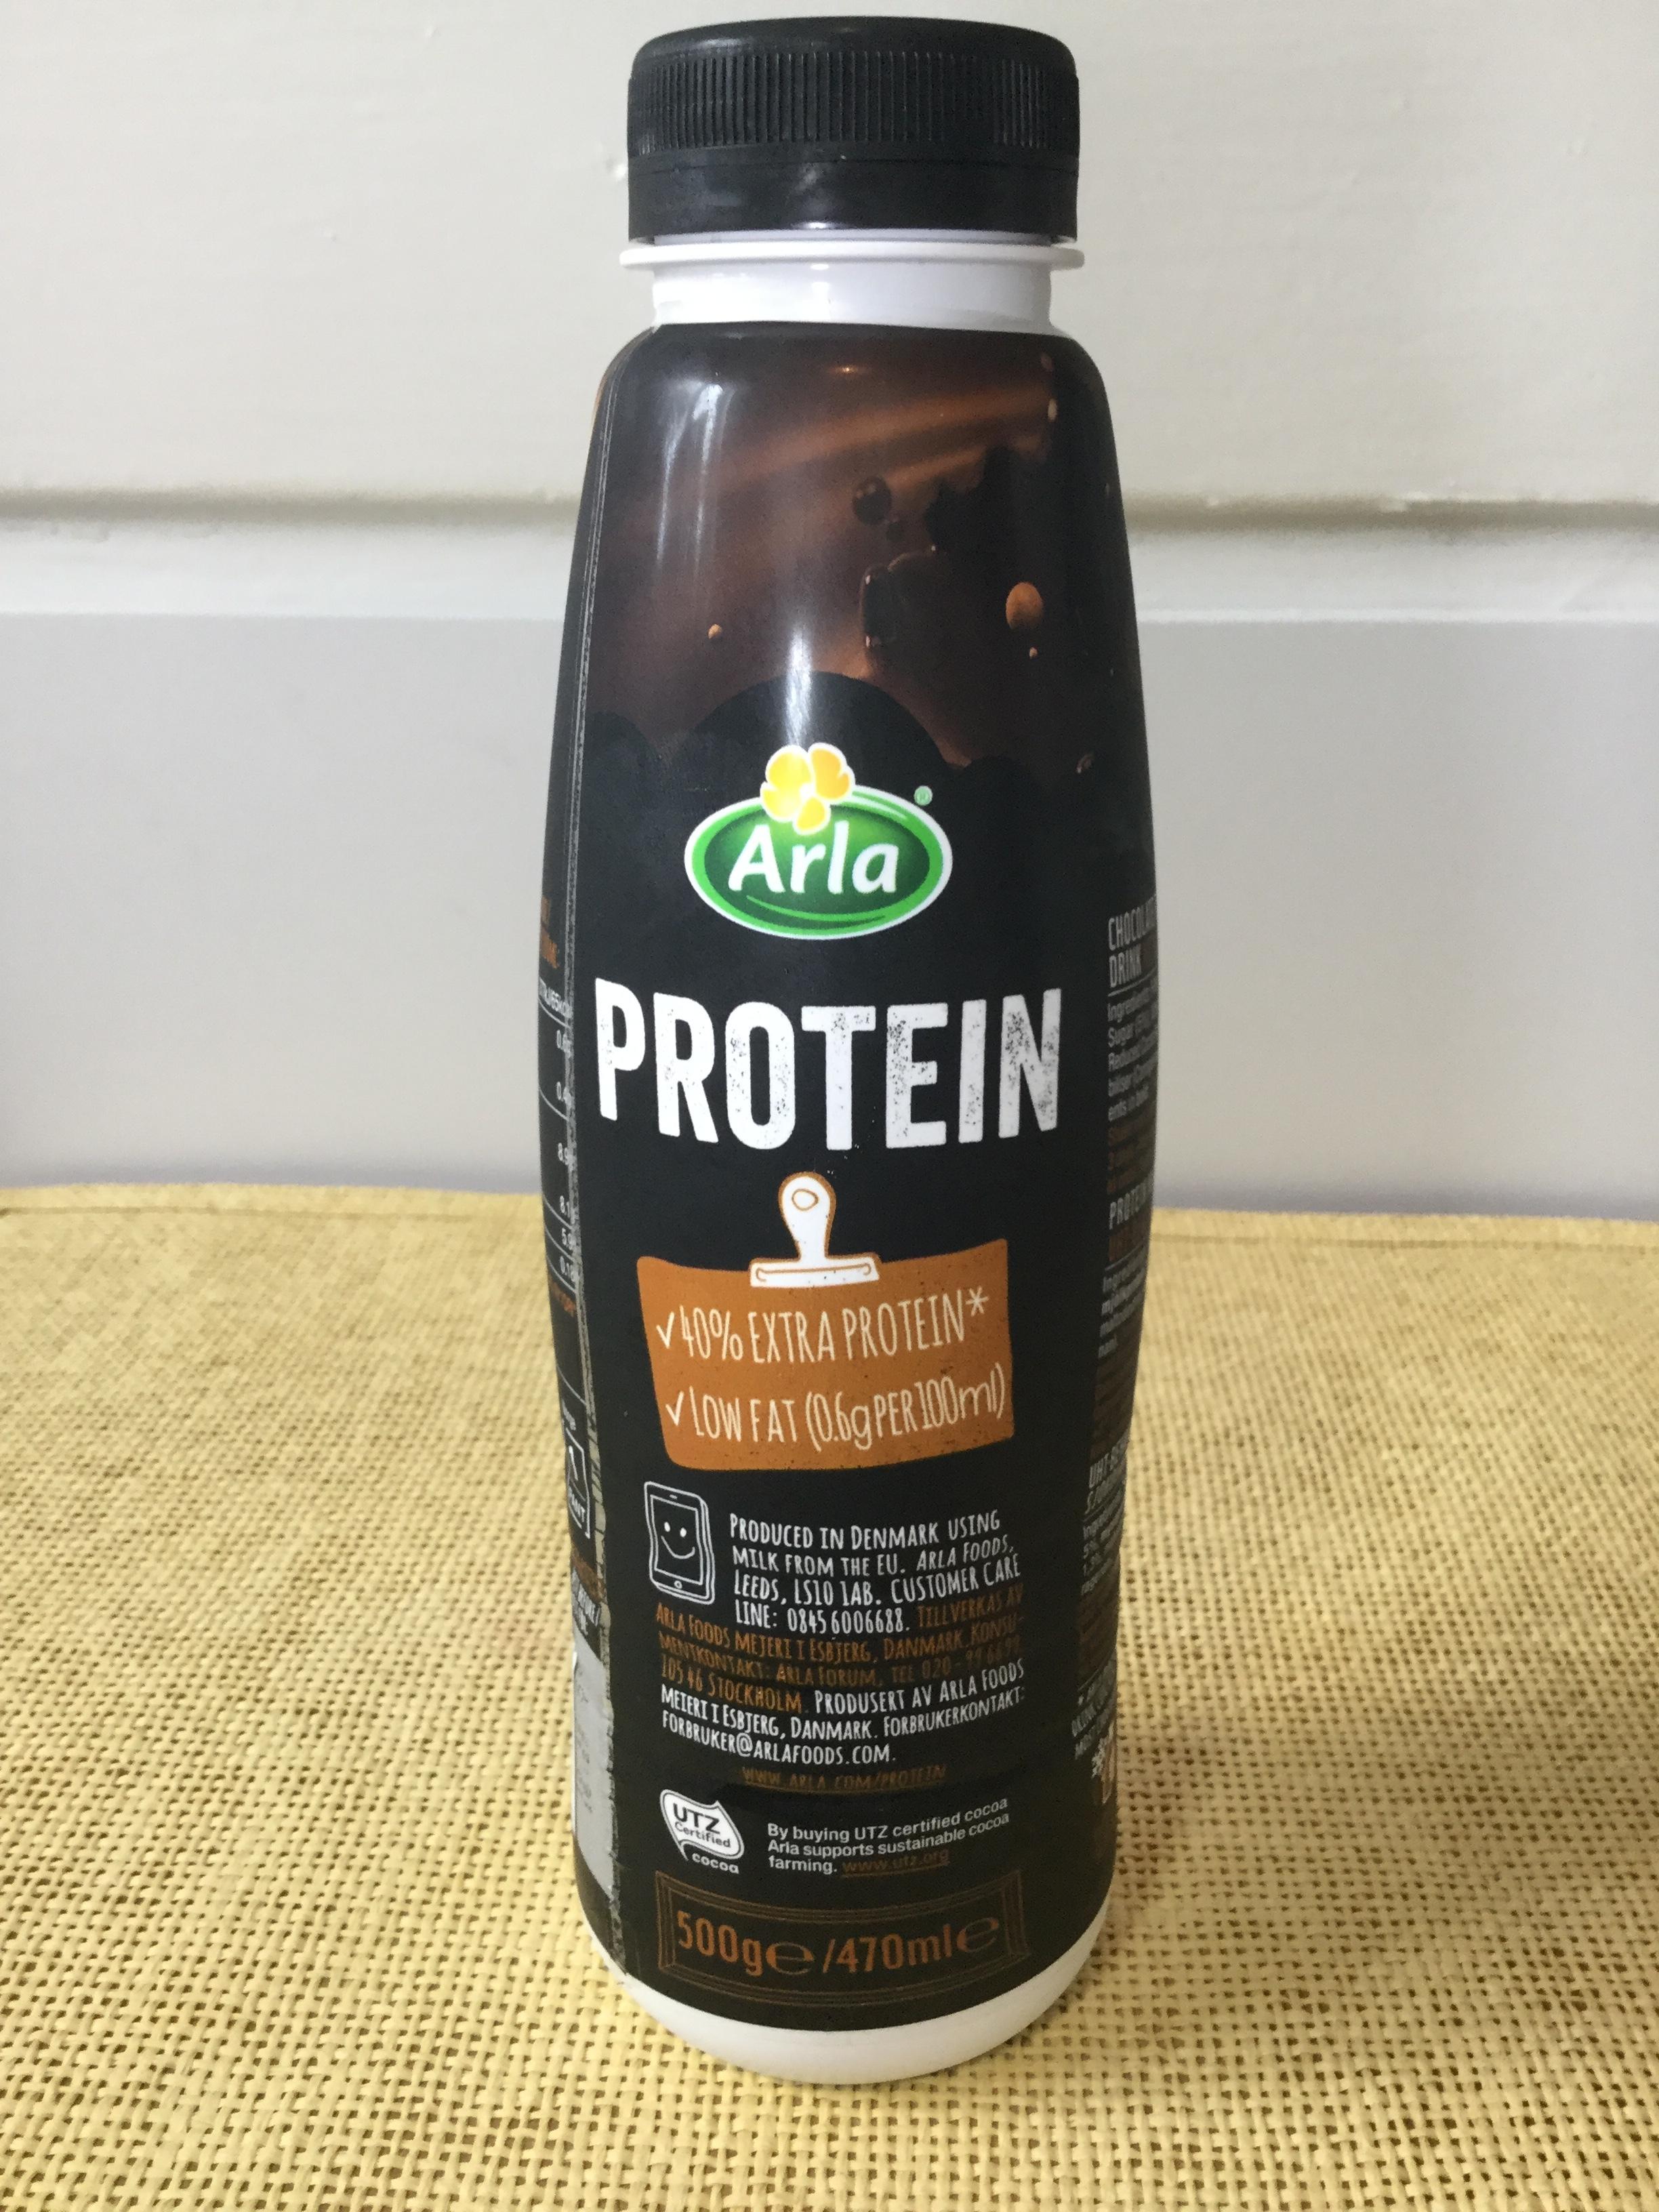 Arla Protein Chocolate Flavoured Milk Drink Side 2